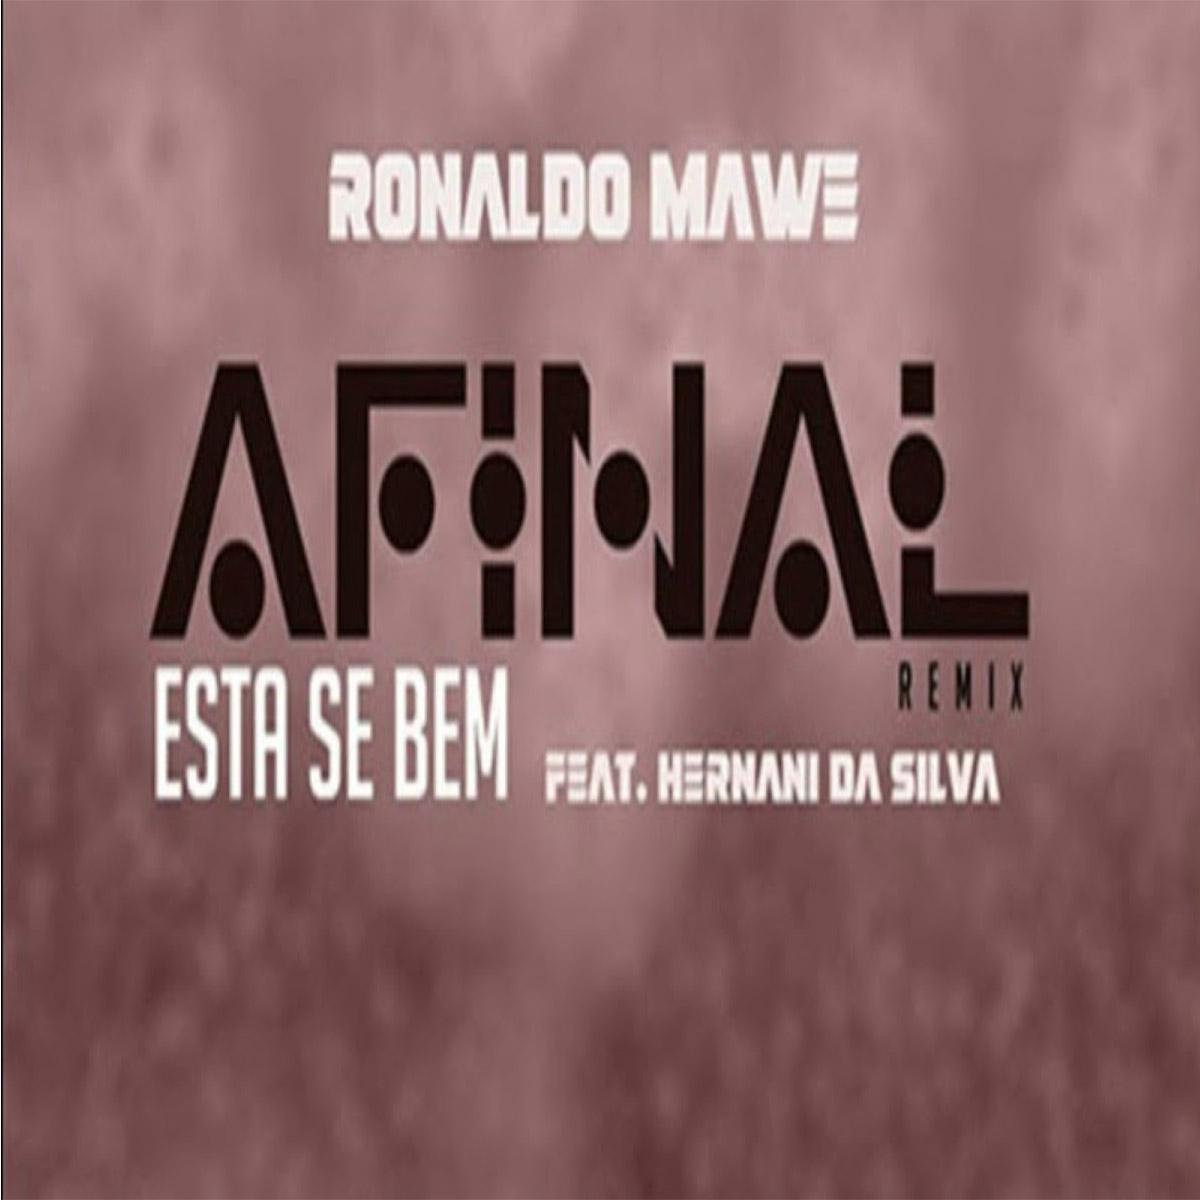 Ronaldo Mawe - Afinal Está Se Bem (Remix) (feat. Hernâni Da Silva)